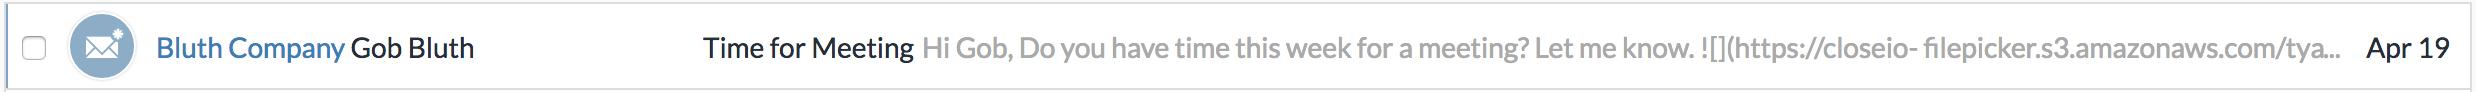 Inbox Reminder Task